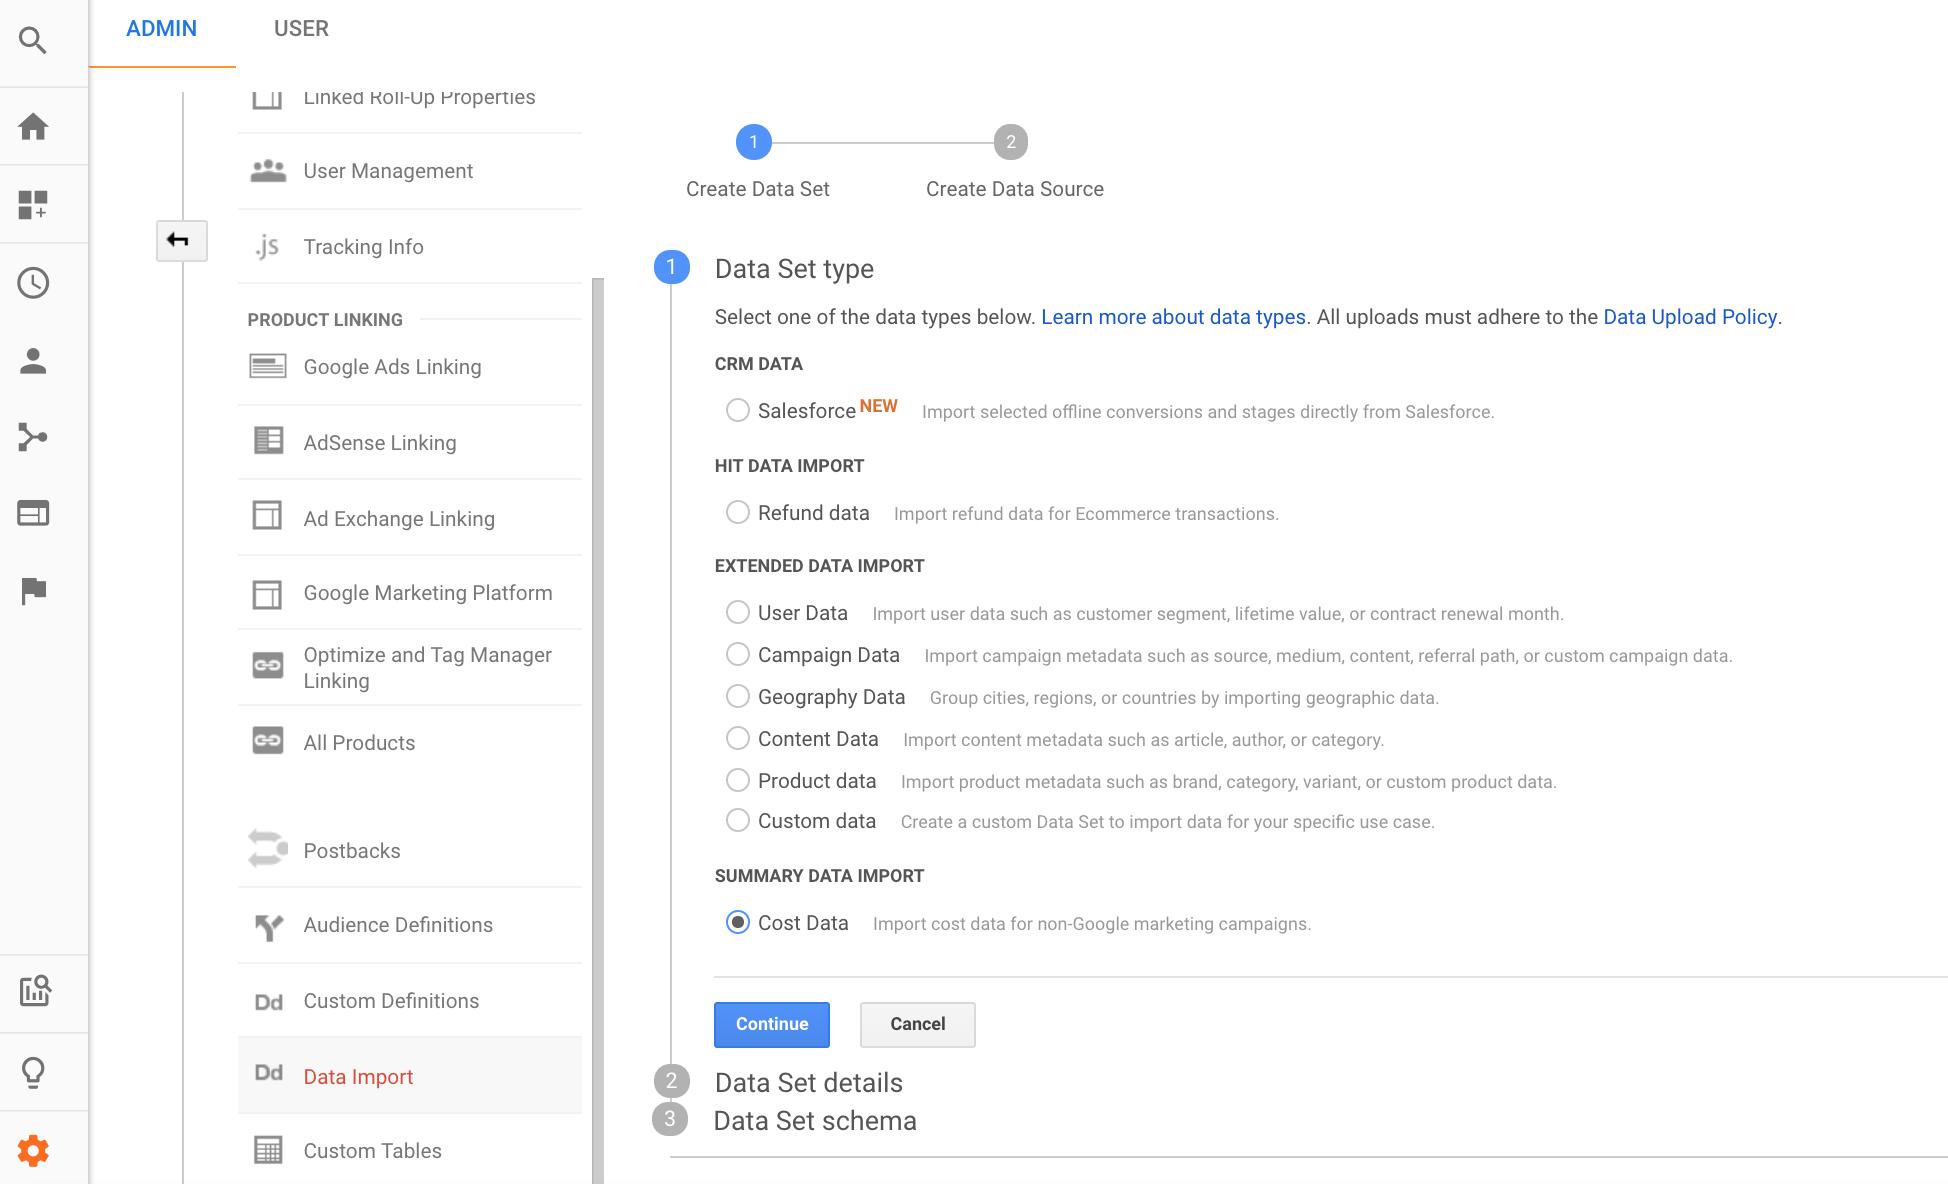 Google Analytics Cost Data Import